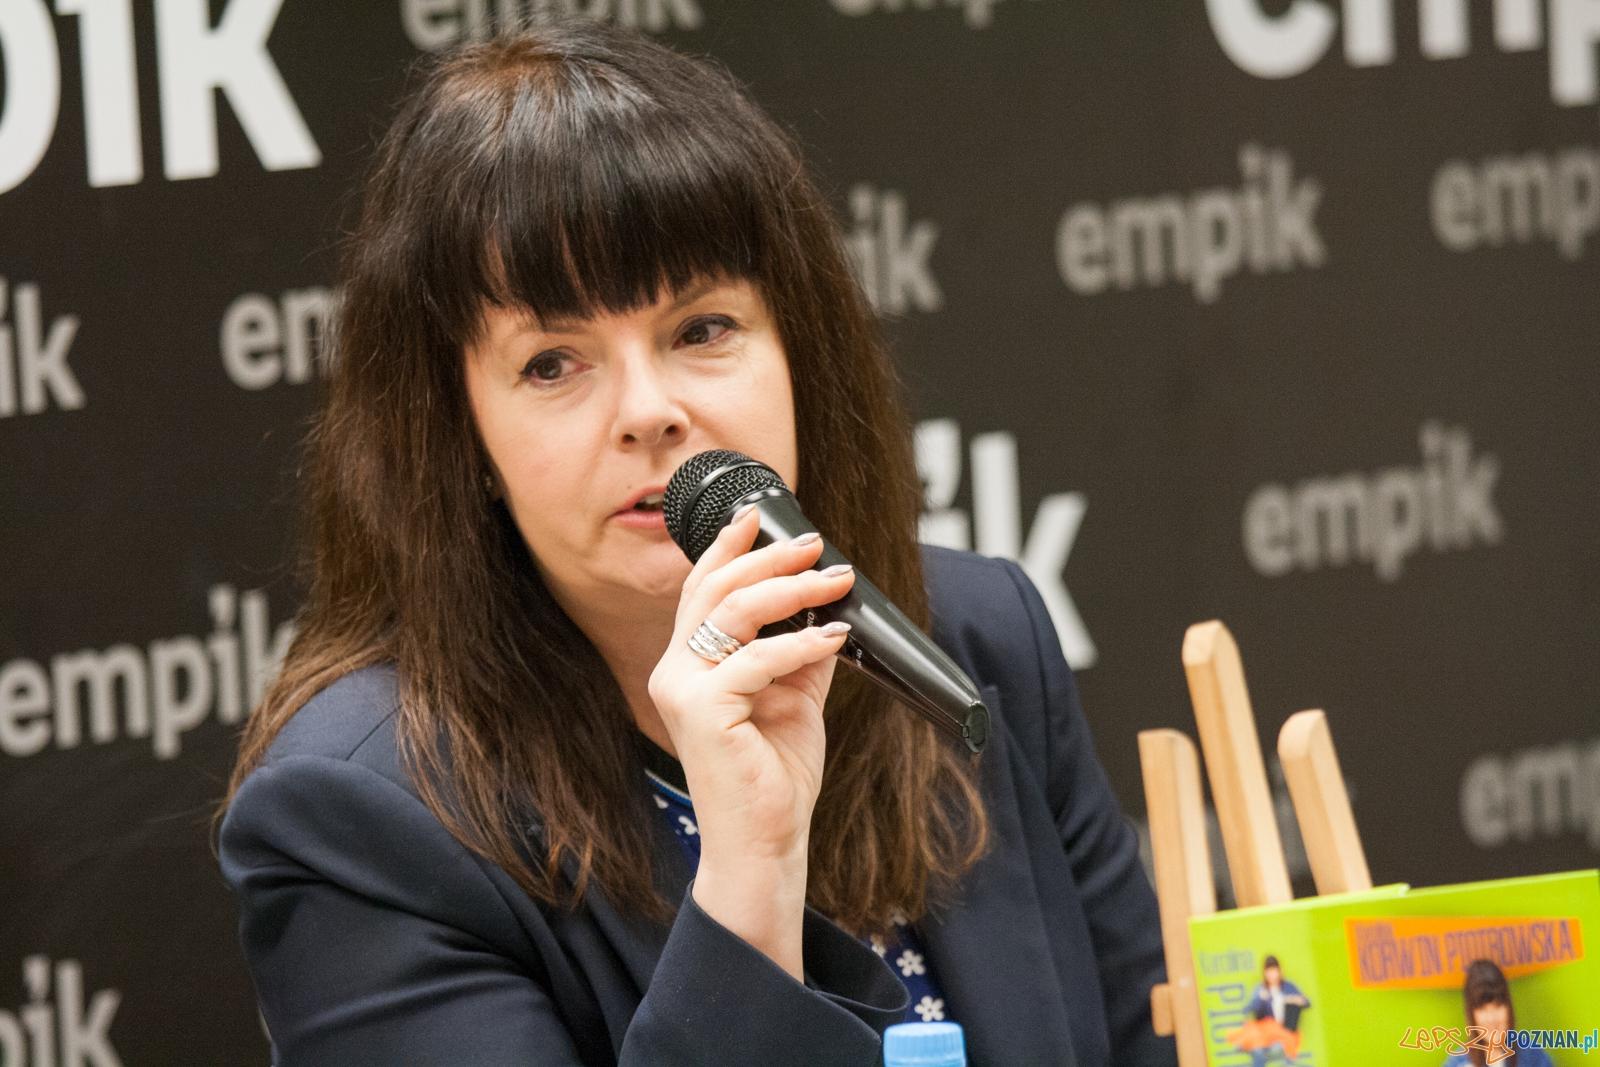 Karolina Korwin Piotrowska (16.04.2016) empik  Foto: © lepszyPOZNAN.pl / Karolina Kiraga